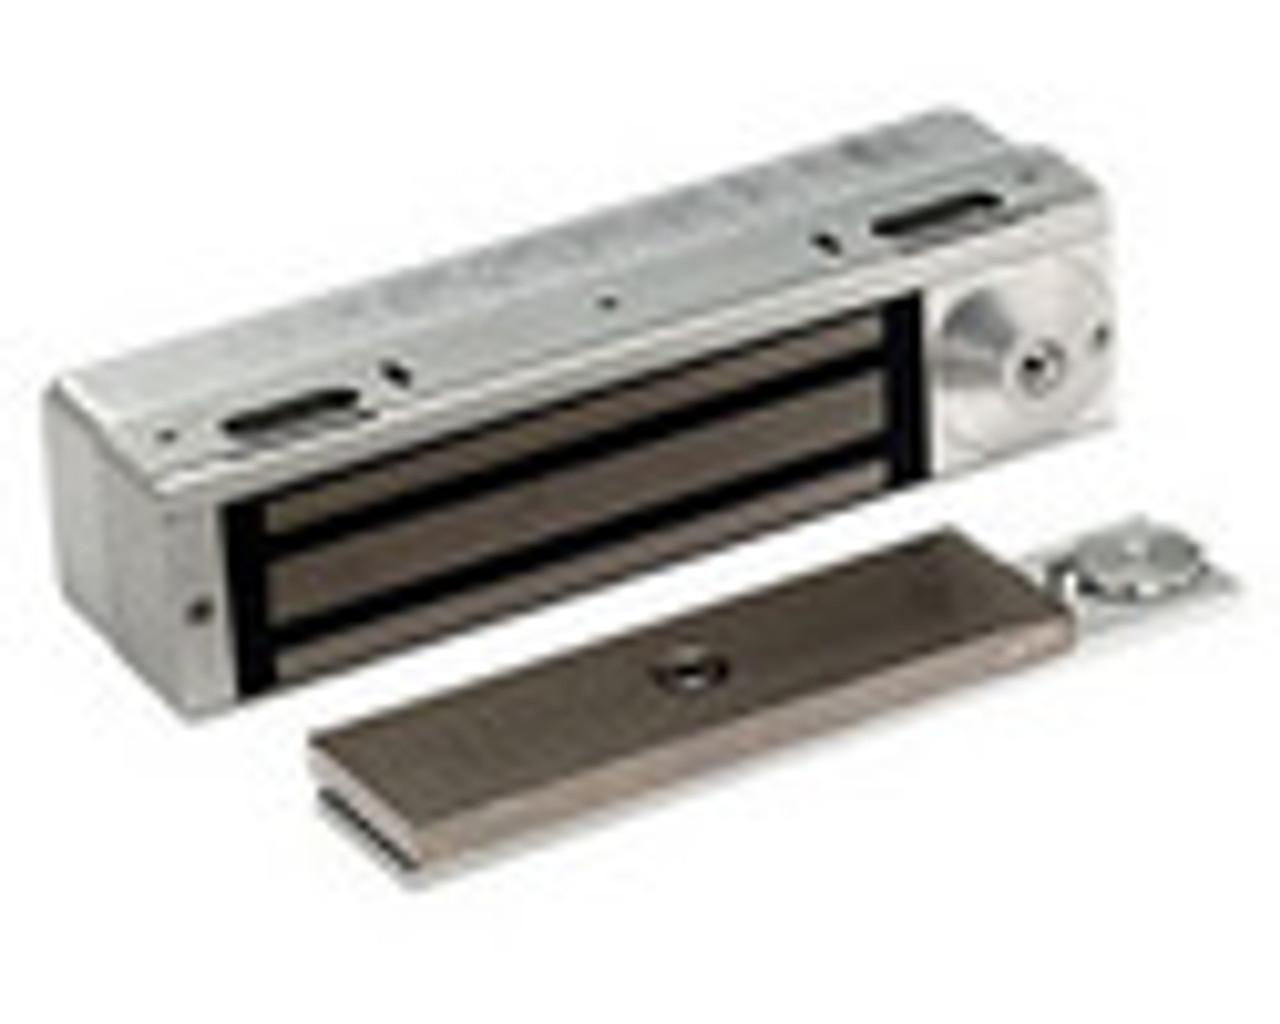 3101C-US10 DynaLock 3101C Series Delay Egress Electromagnetic Lock for Single Outswing Door in Satin Bronze